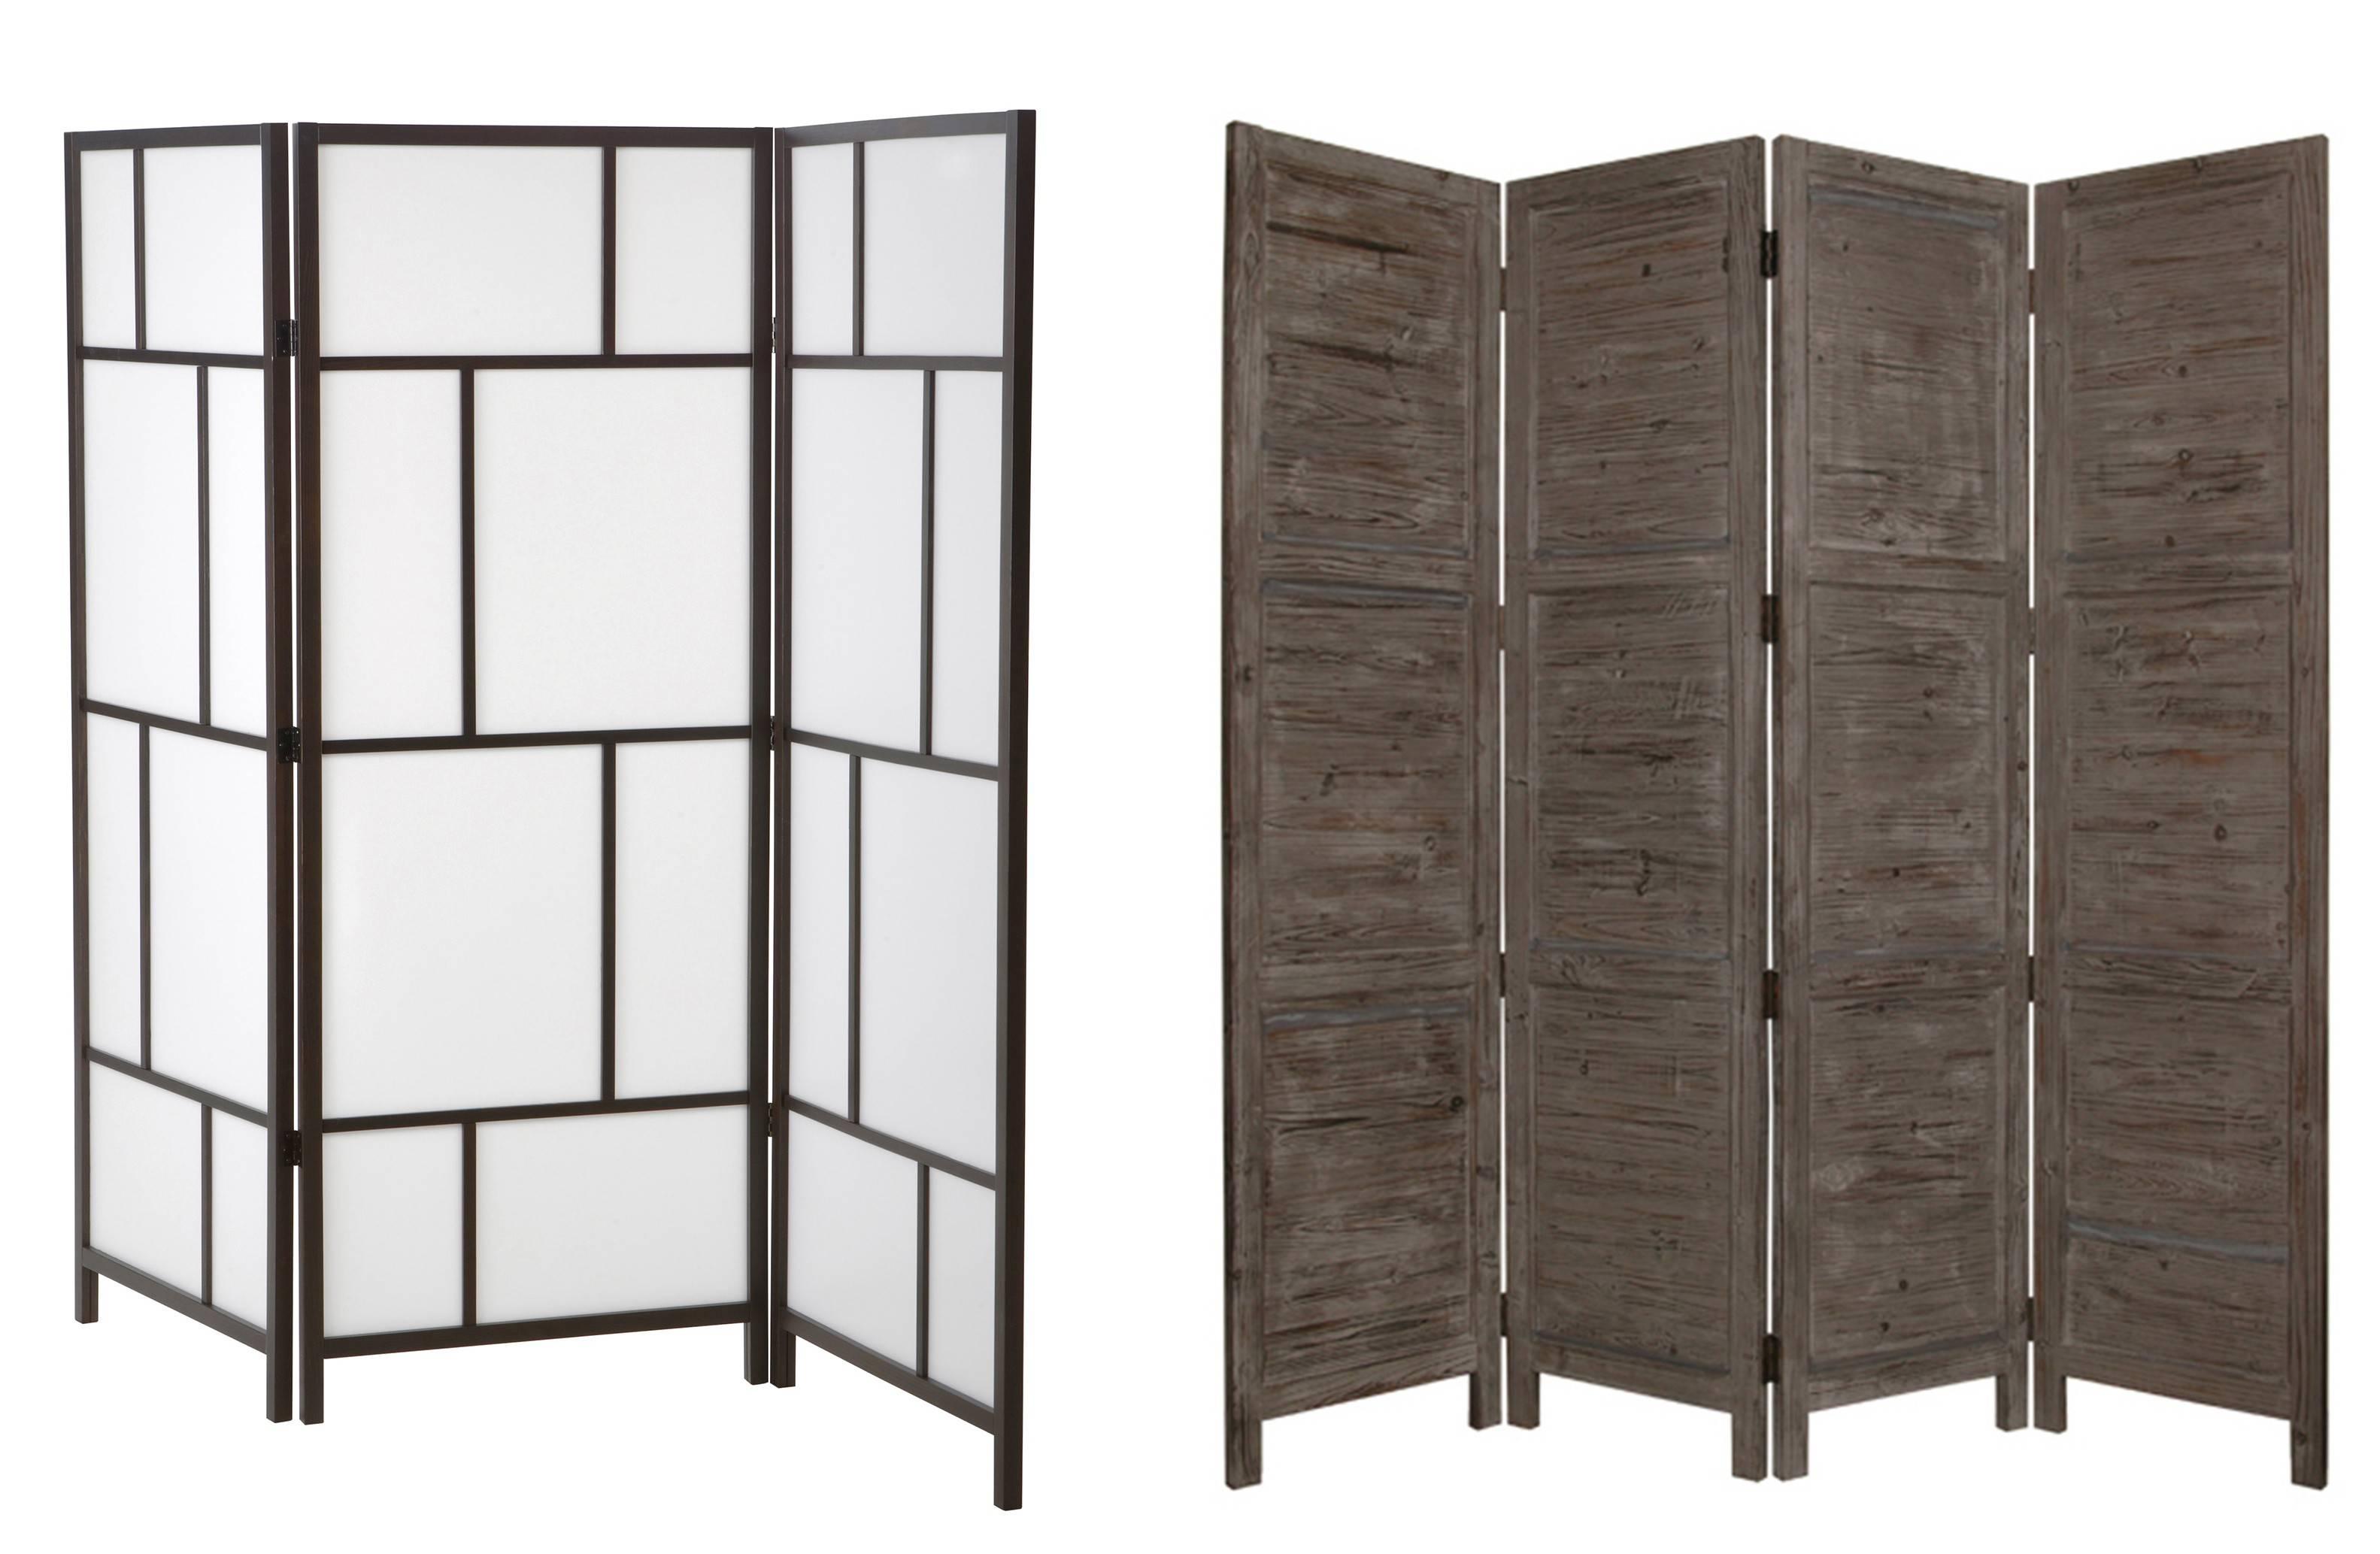 World Market Wooden Room Divider Accent Furniture Room Dividers